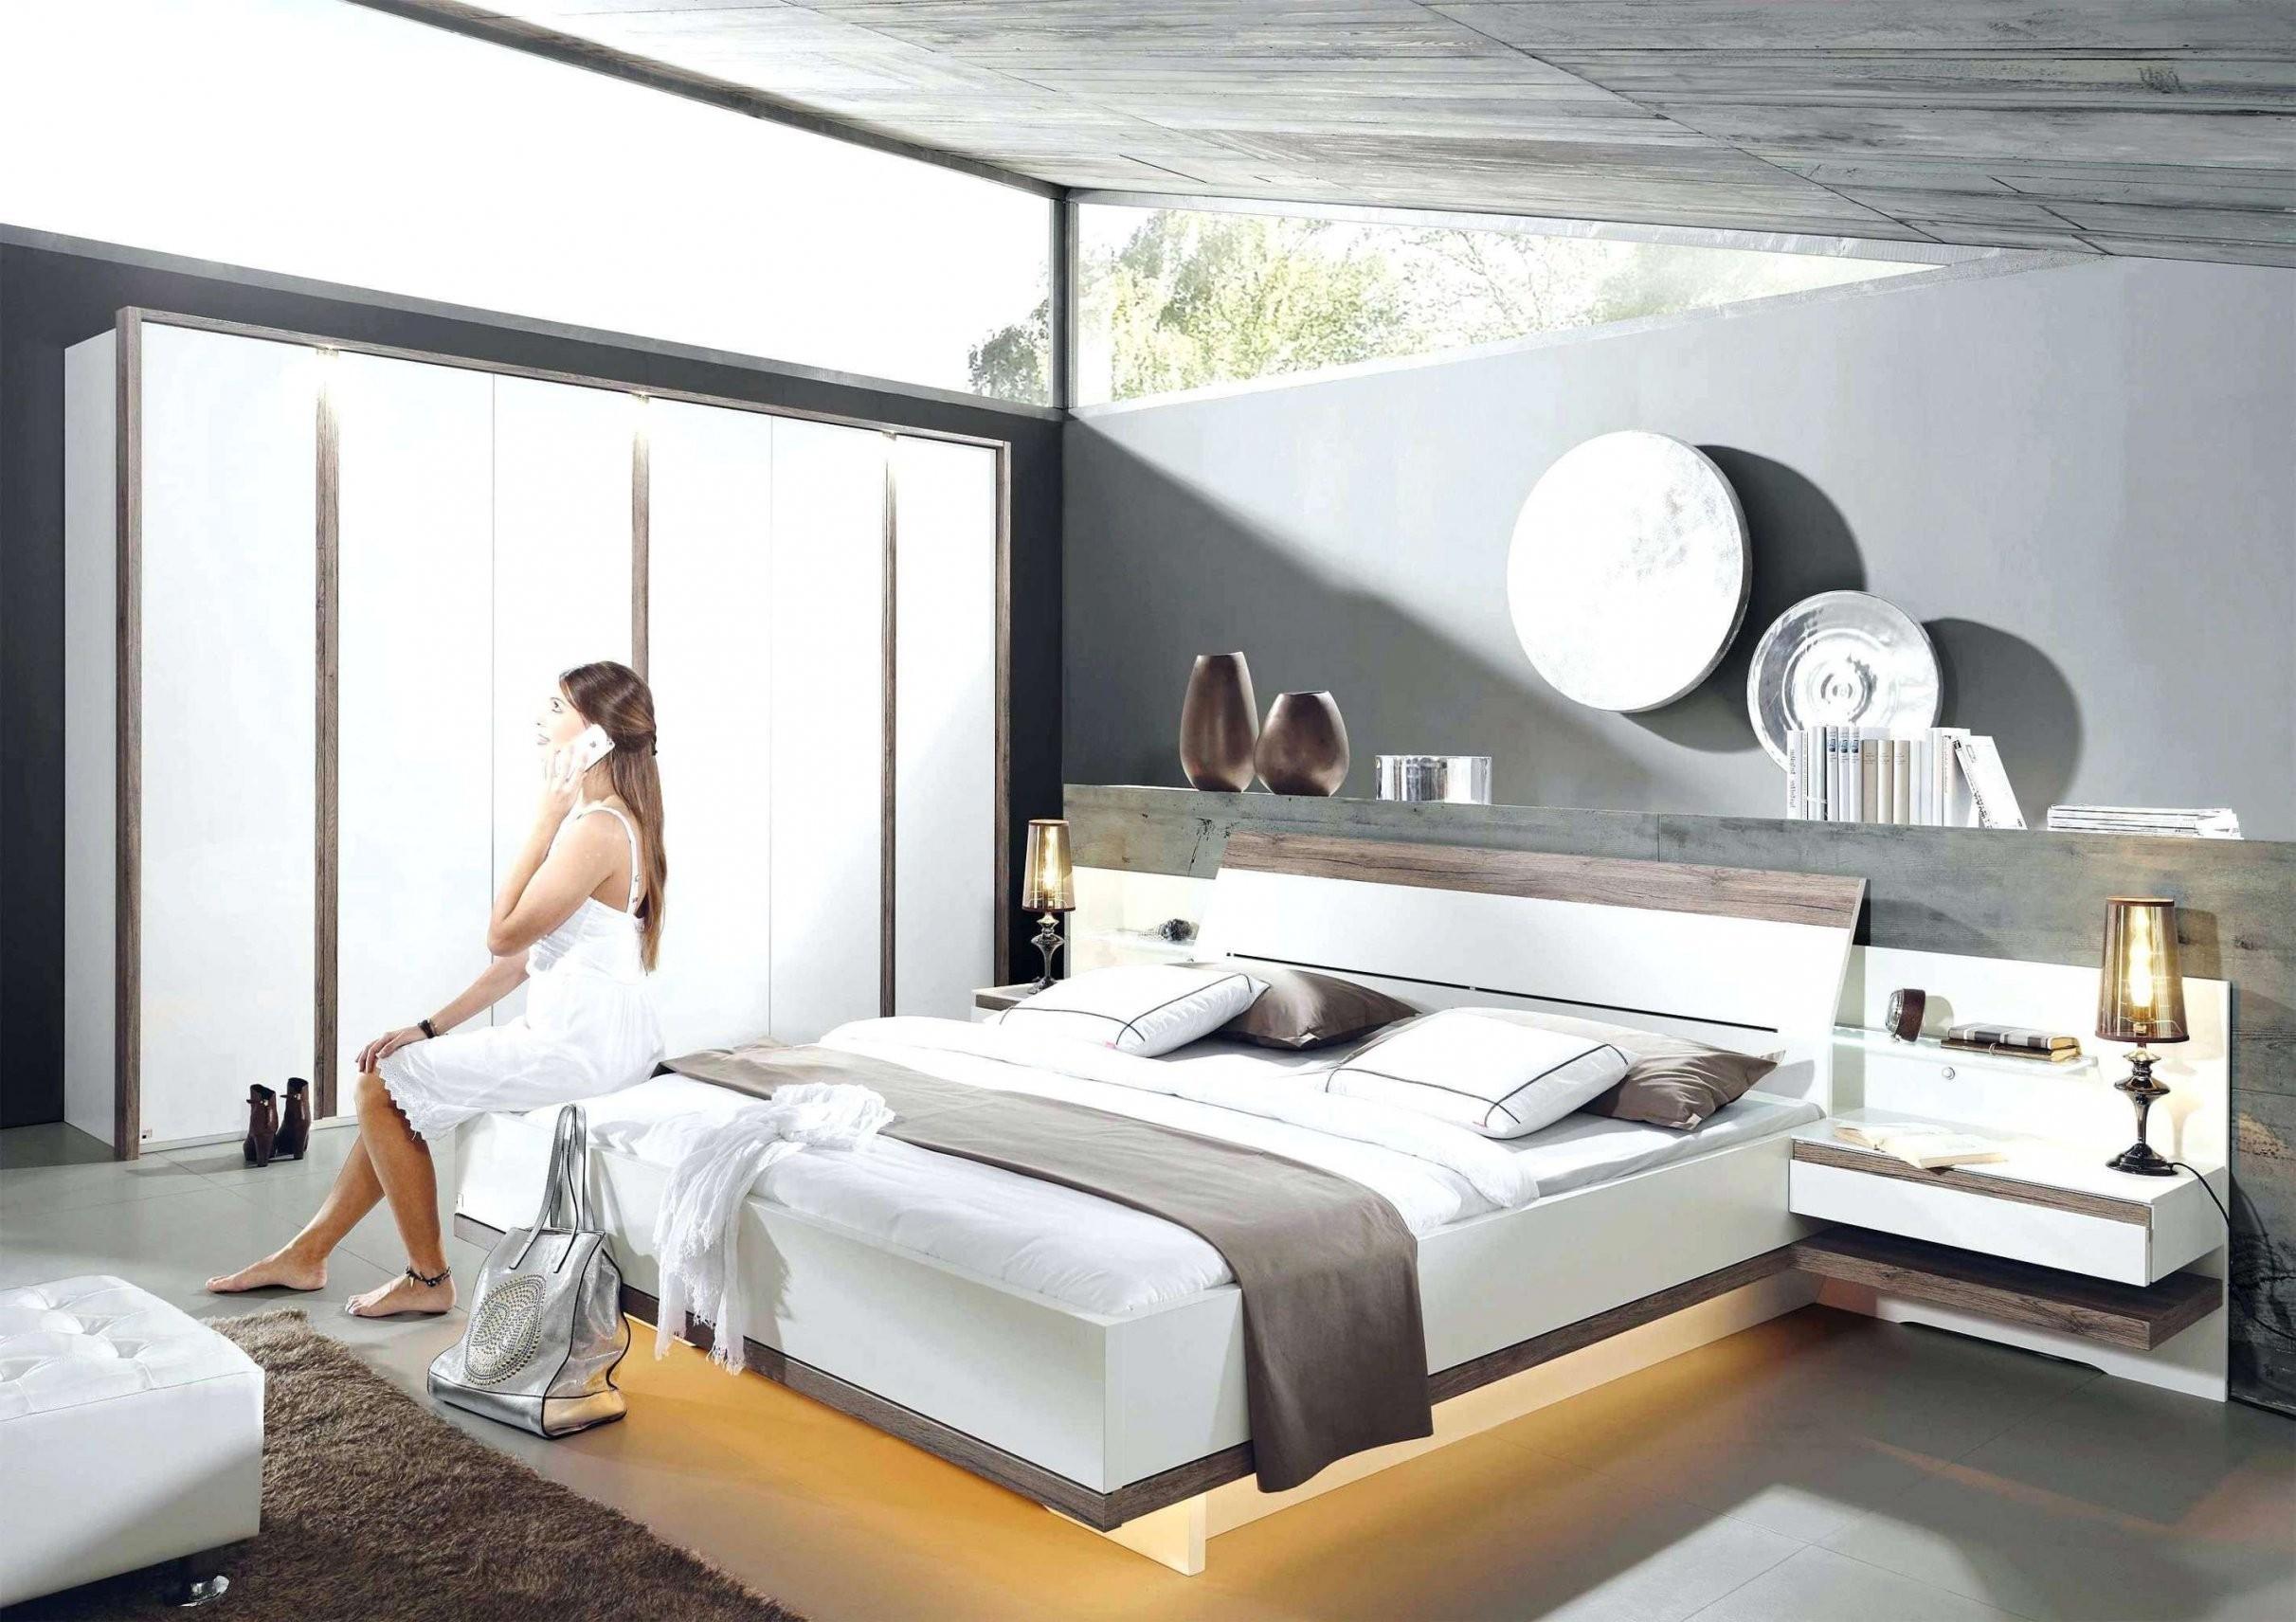 Ruf Betten Mit Bettkasten Awesome Bett 200 X 100 Inspirierend Schön von Ruf Bett Mit Bettkasten Photo